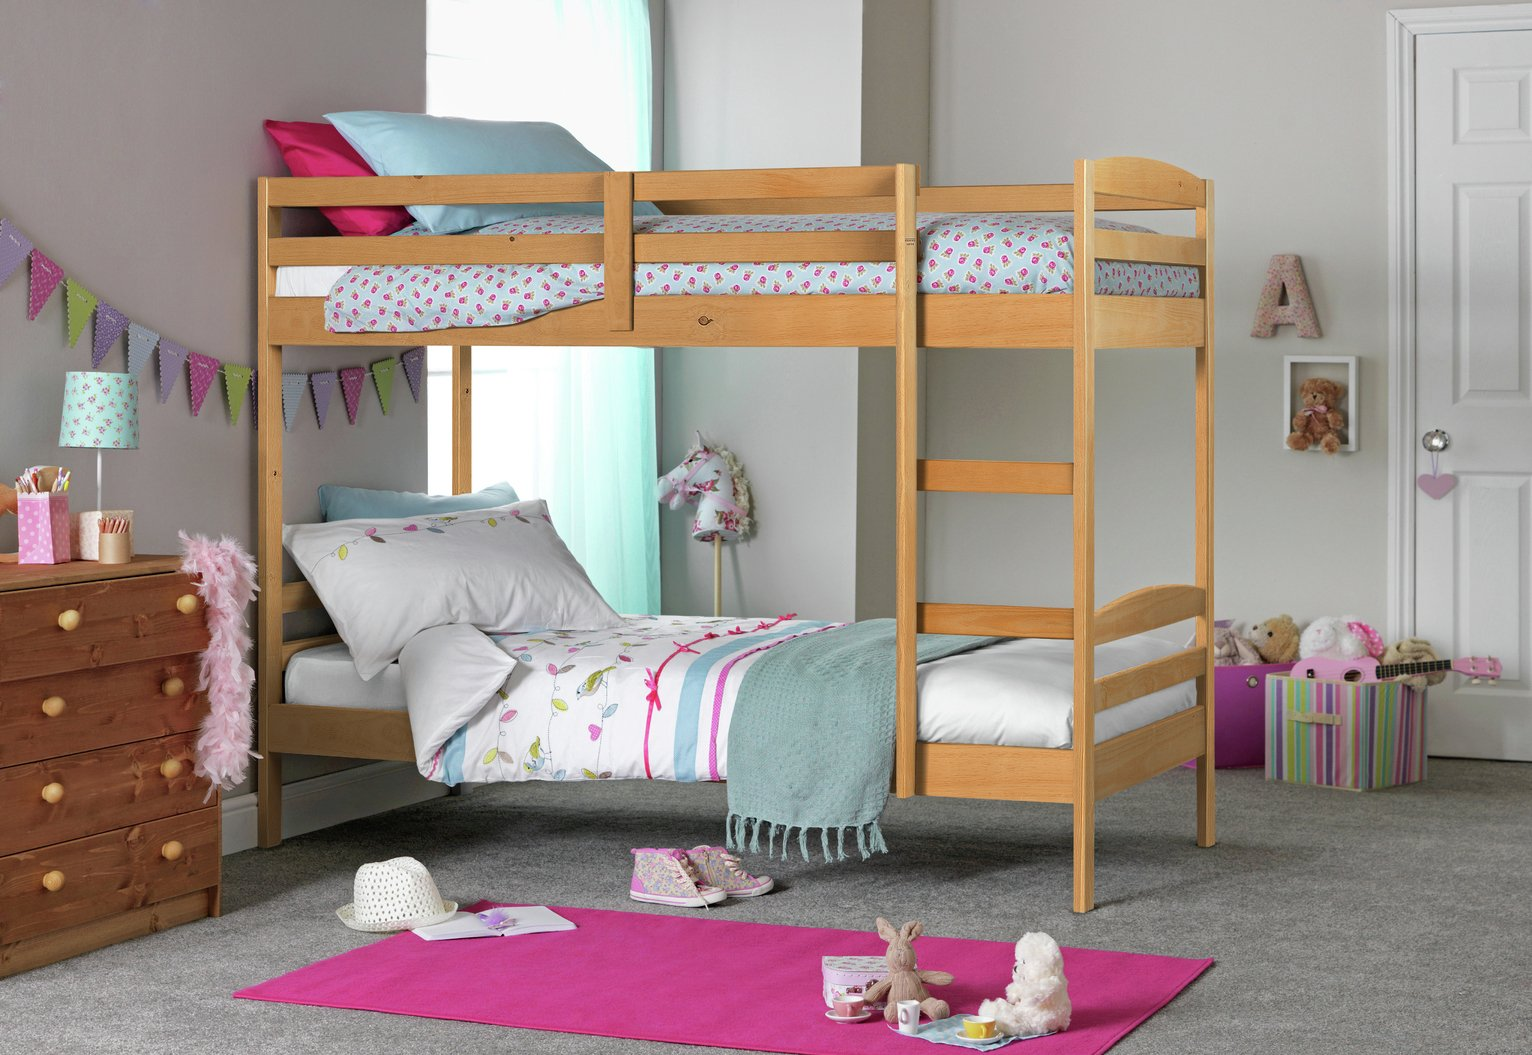 Argos Home Josie Shorty Bunk Bed Frame - Pine